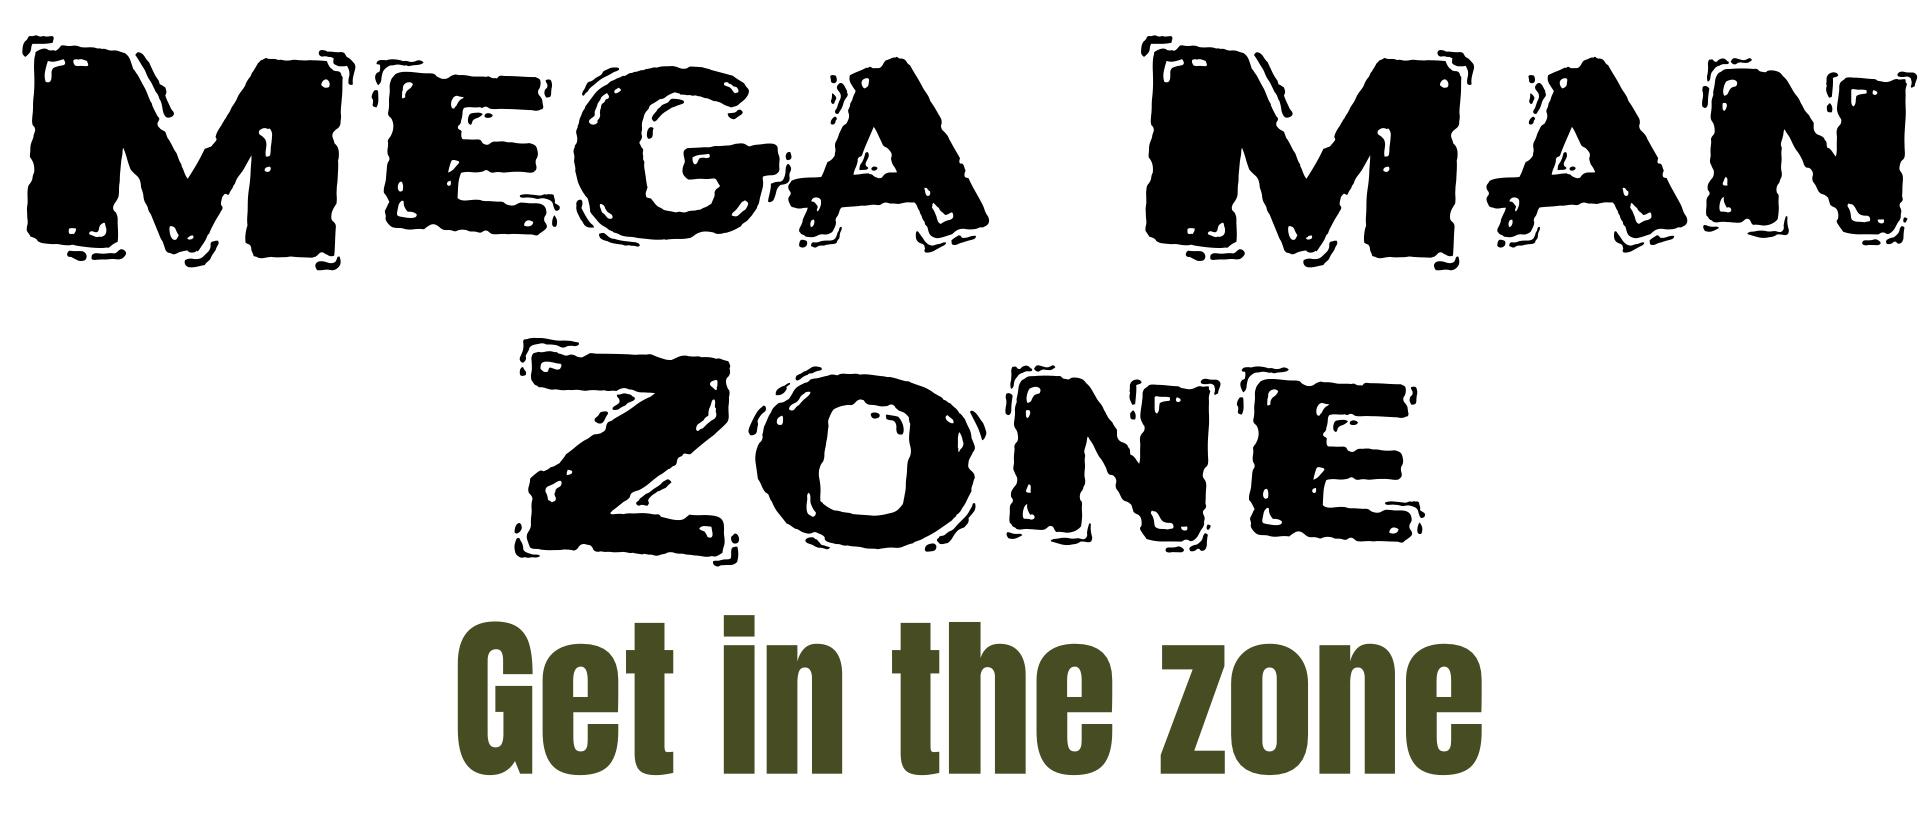 Mega Man Zone